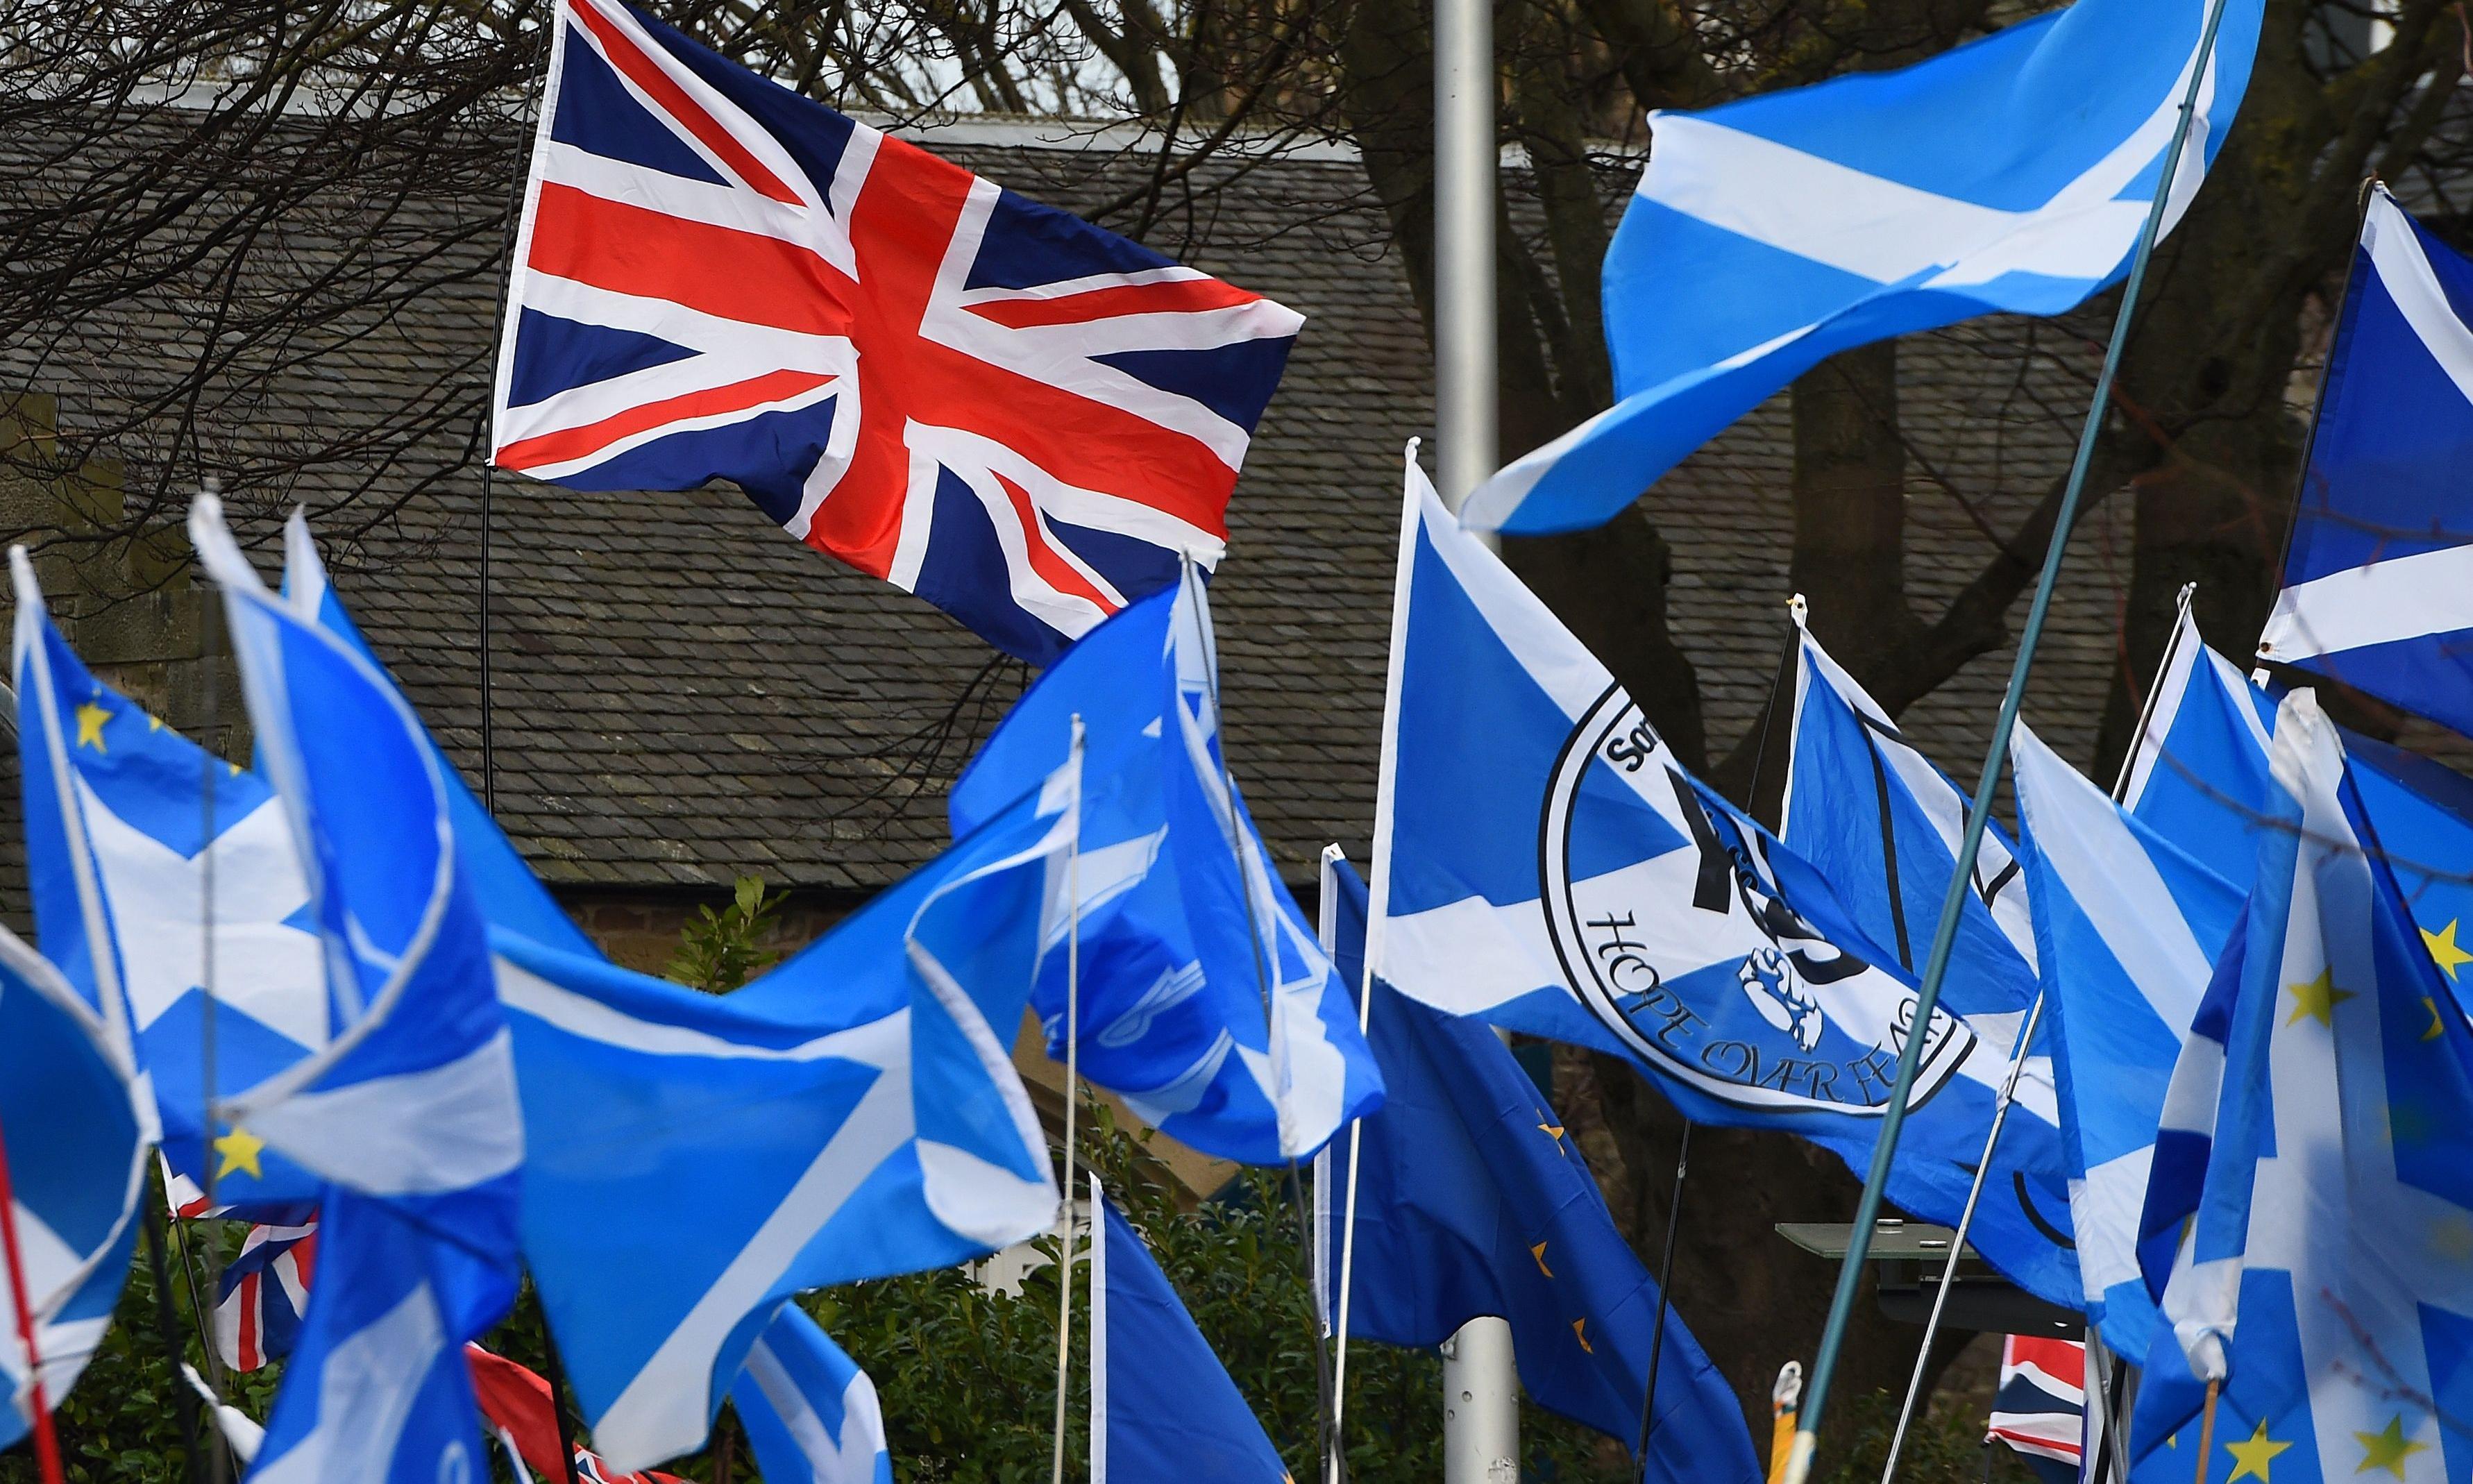 Scottish nationalism is no more benign than its English equivalent